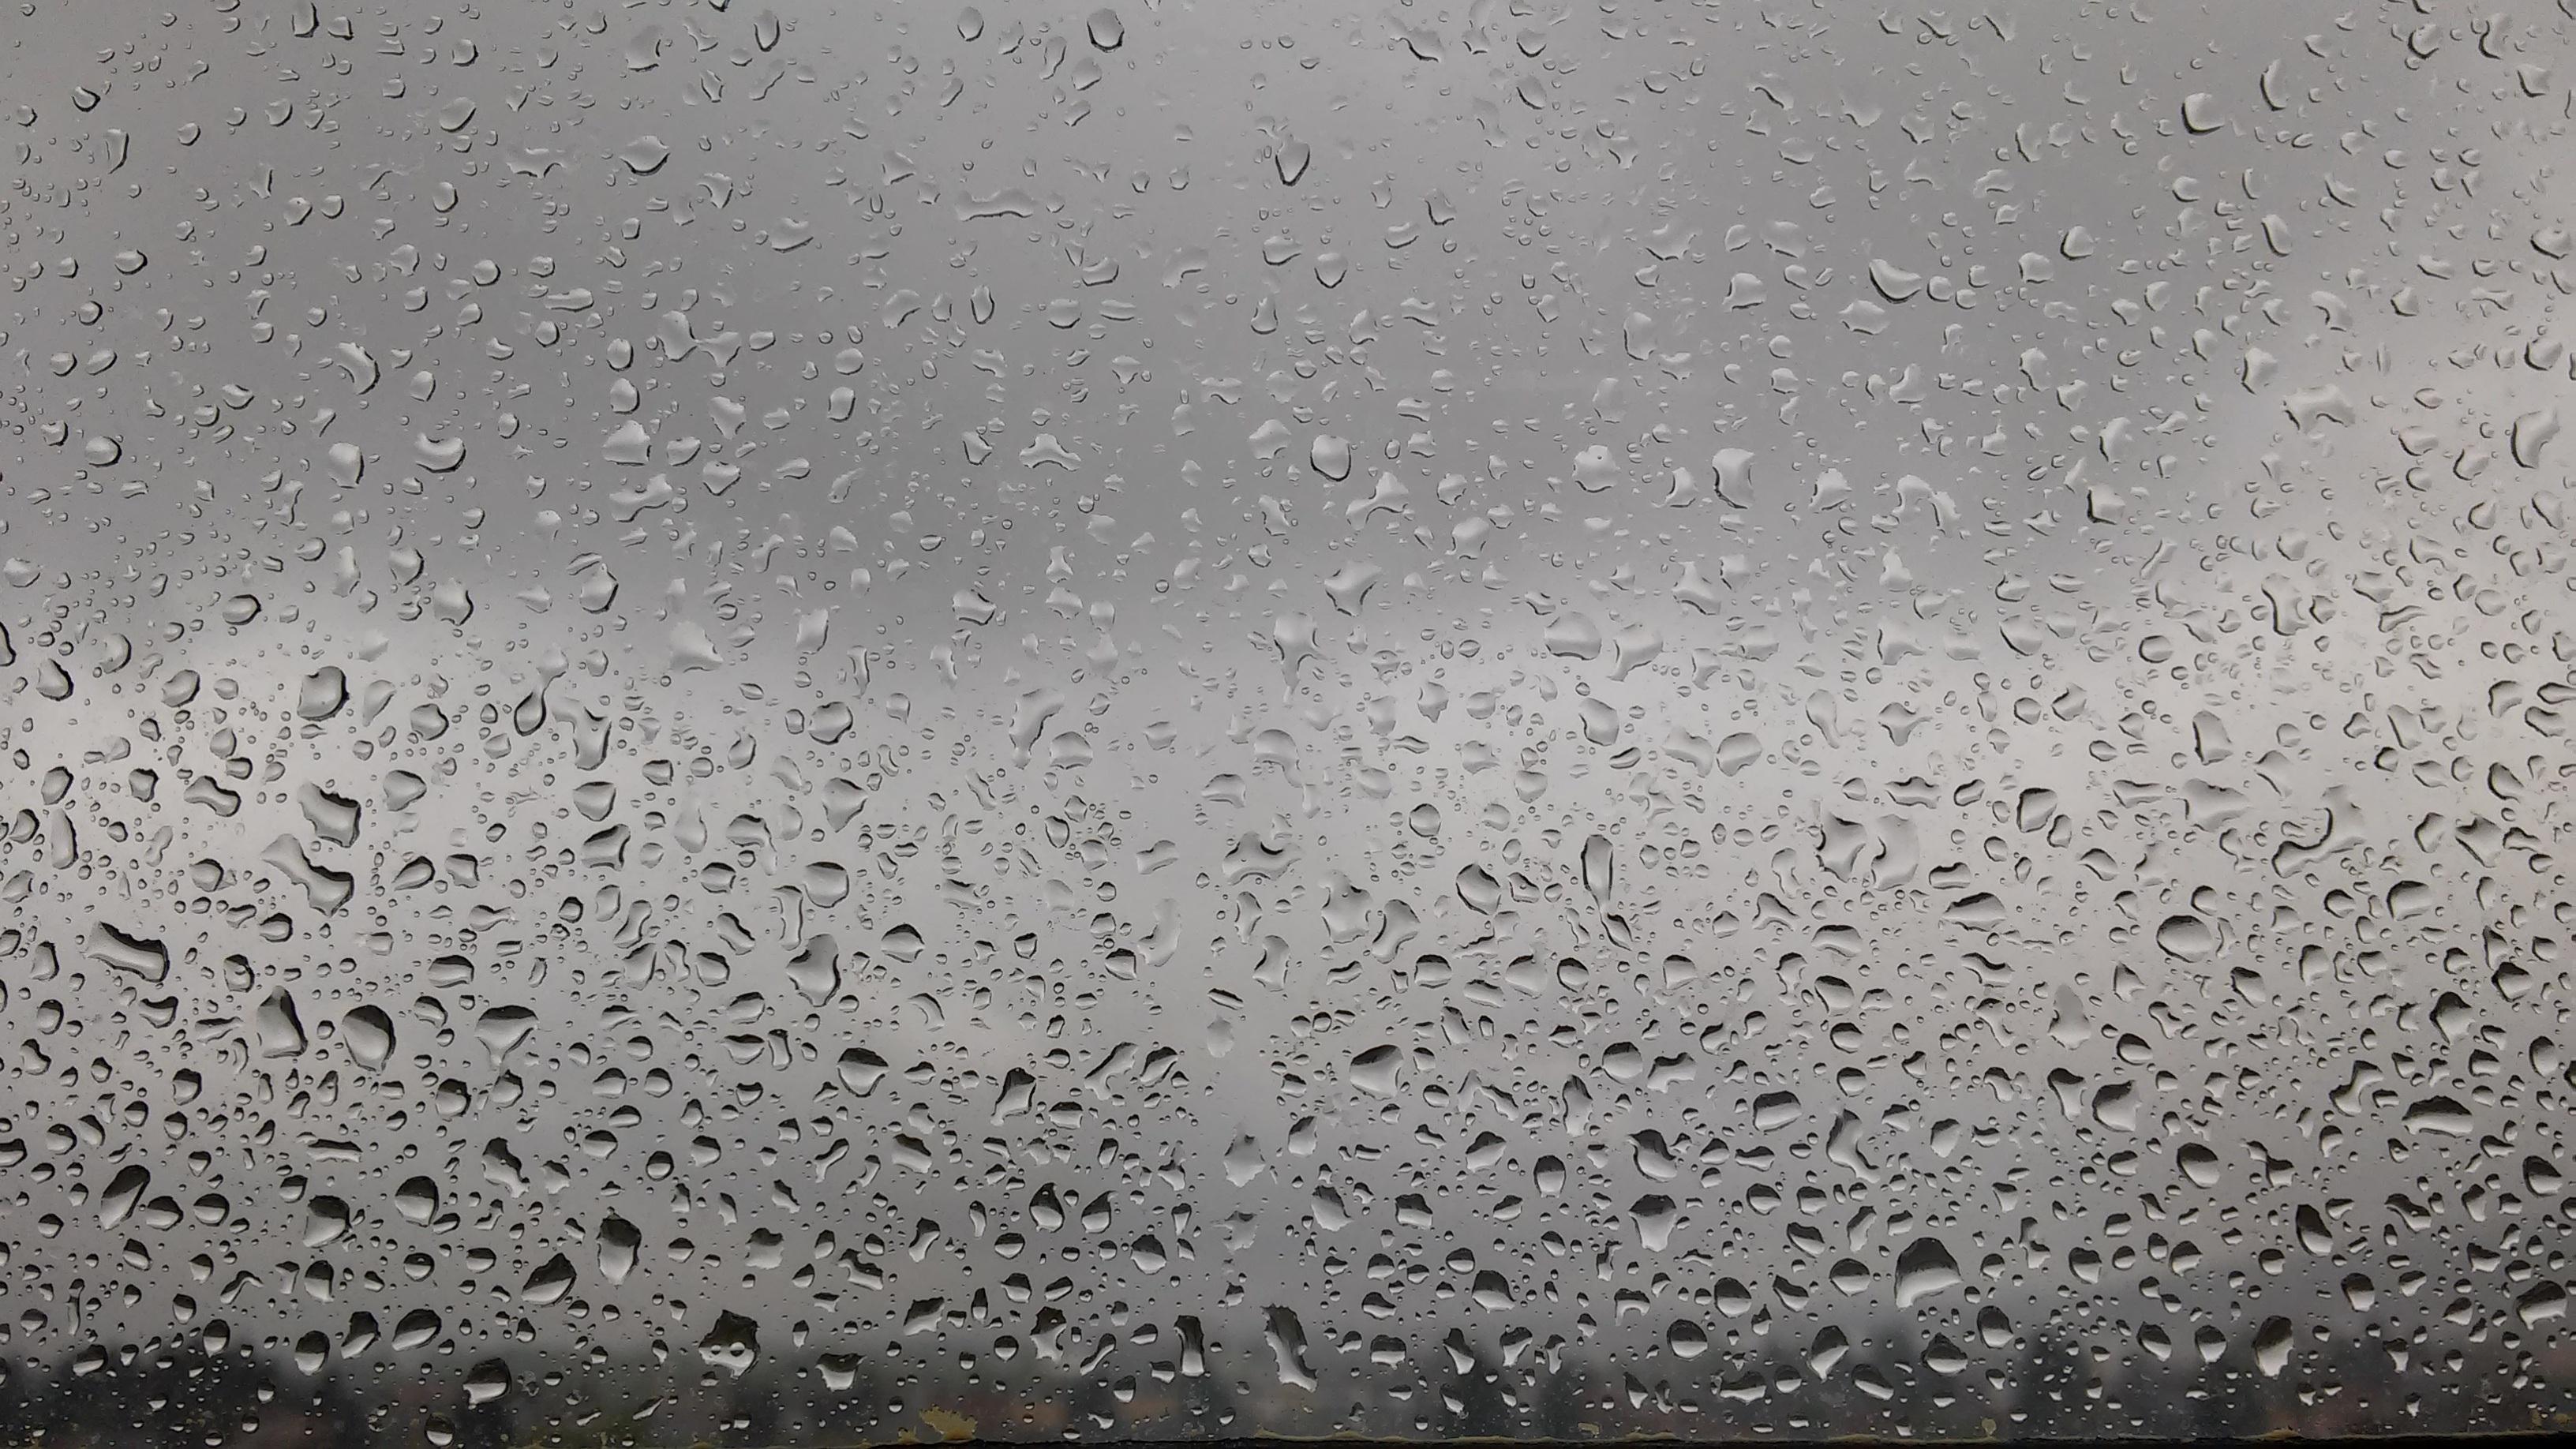 glass window texture. Water Snow Drop Texture Rain Window Glass Wet Asphalt Pattern Weather Soil Monochrome Drip Grey Background I